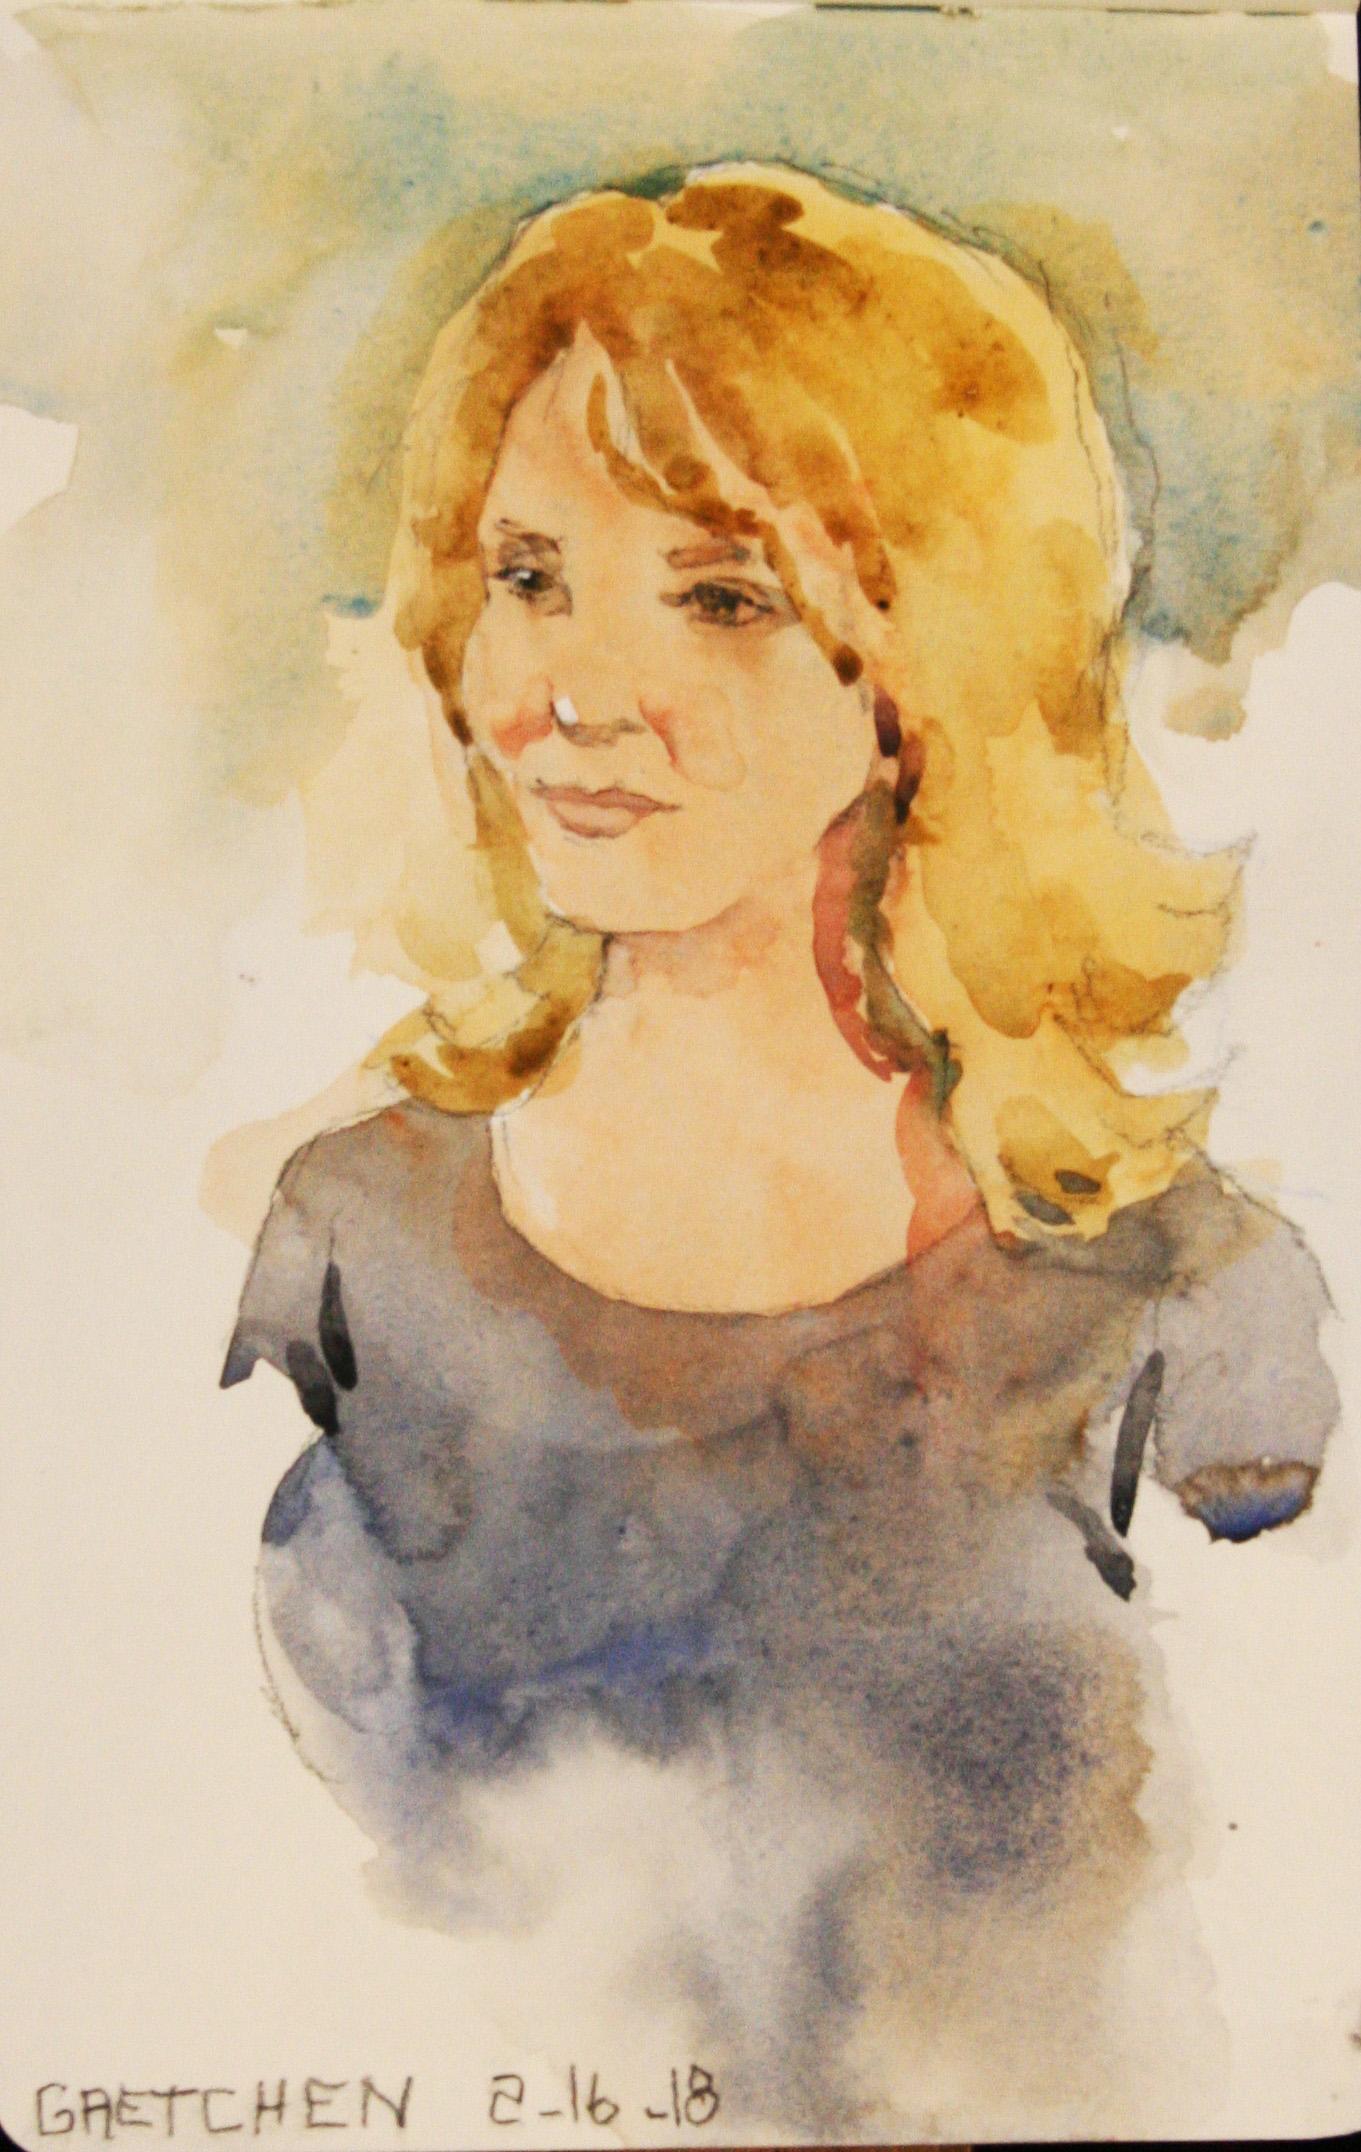 Jeff Suntala did this watercolor.